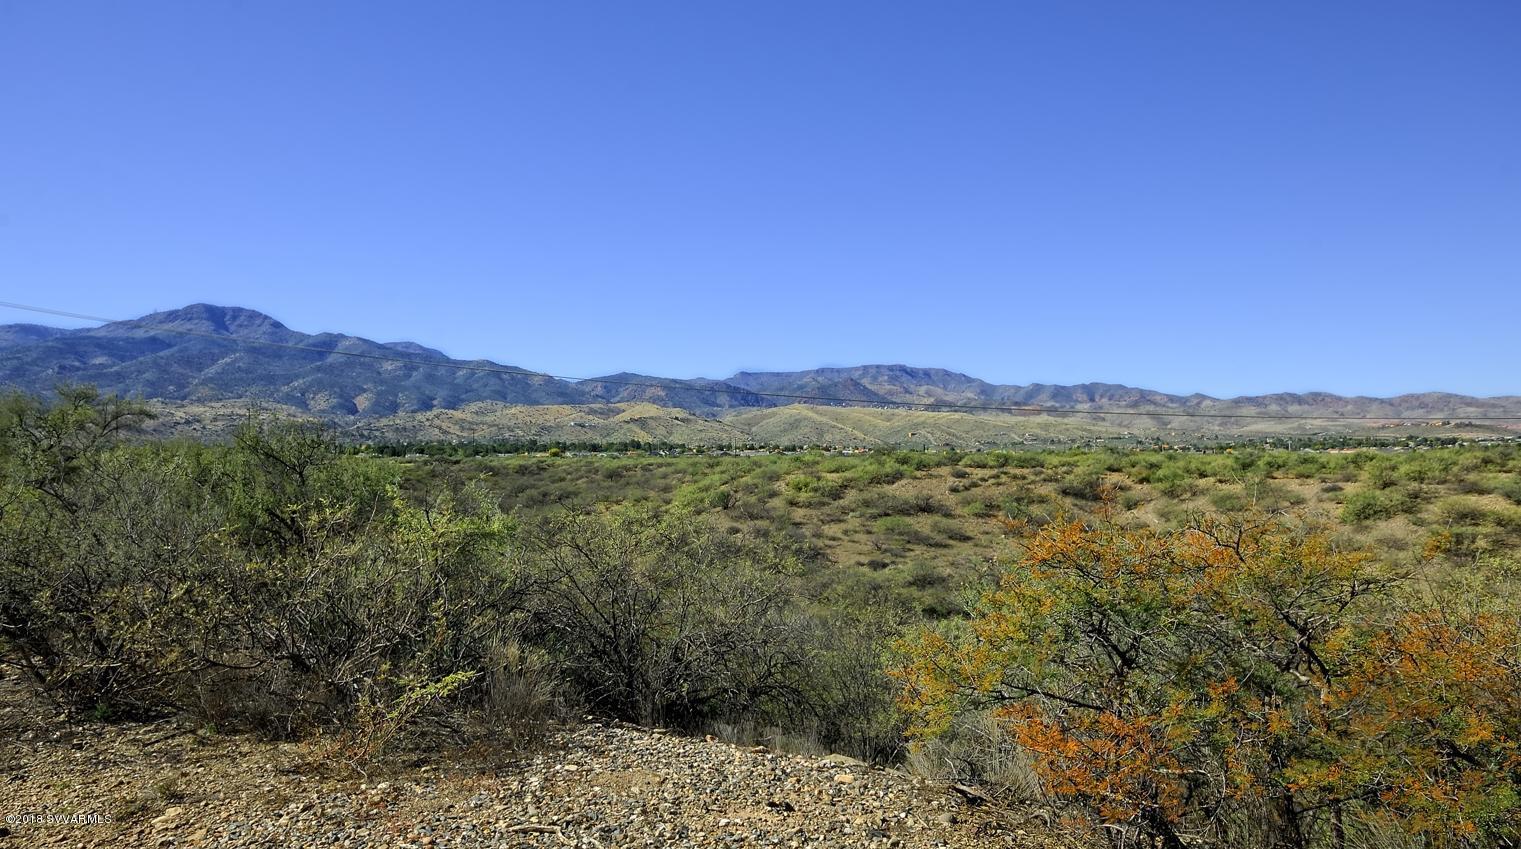 509 N Yucca St Cottonwood, AZ 86326